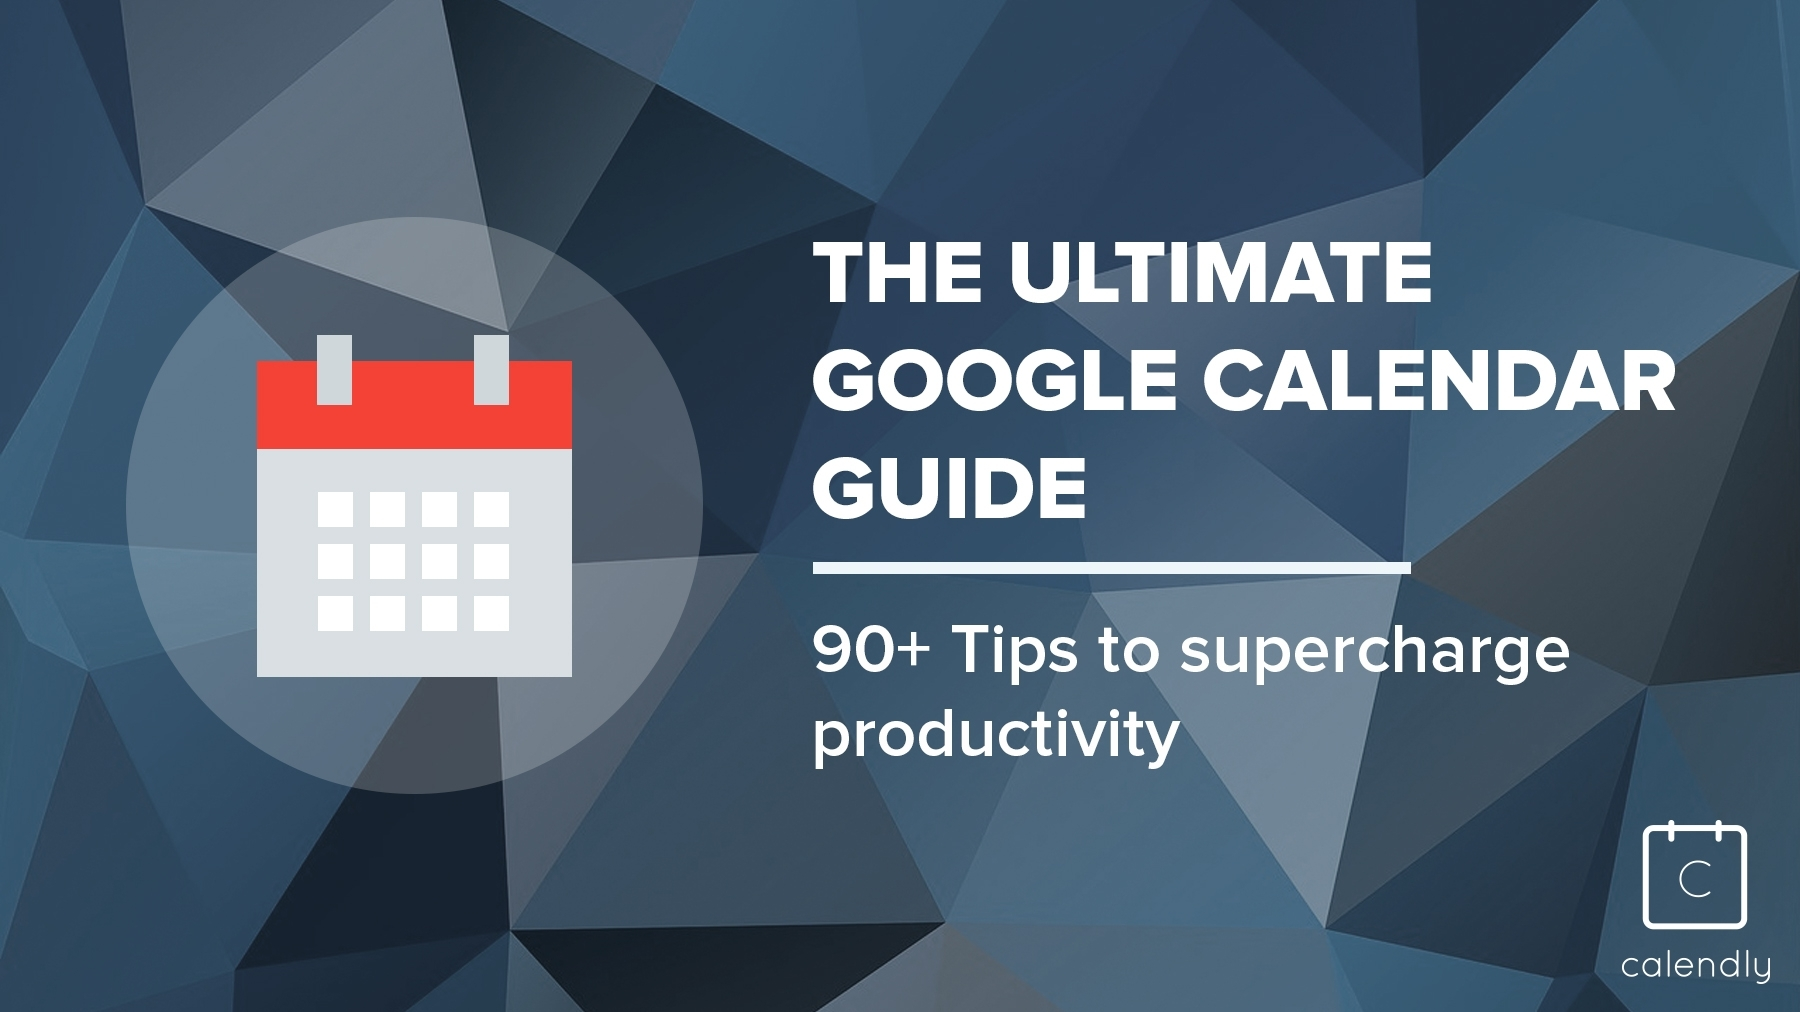 Blog - The Ultimate Google Calendar Guide: 90+ Tips